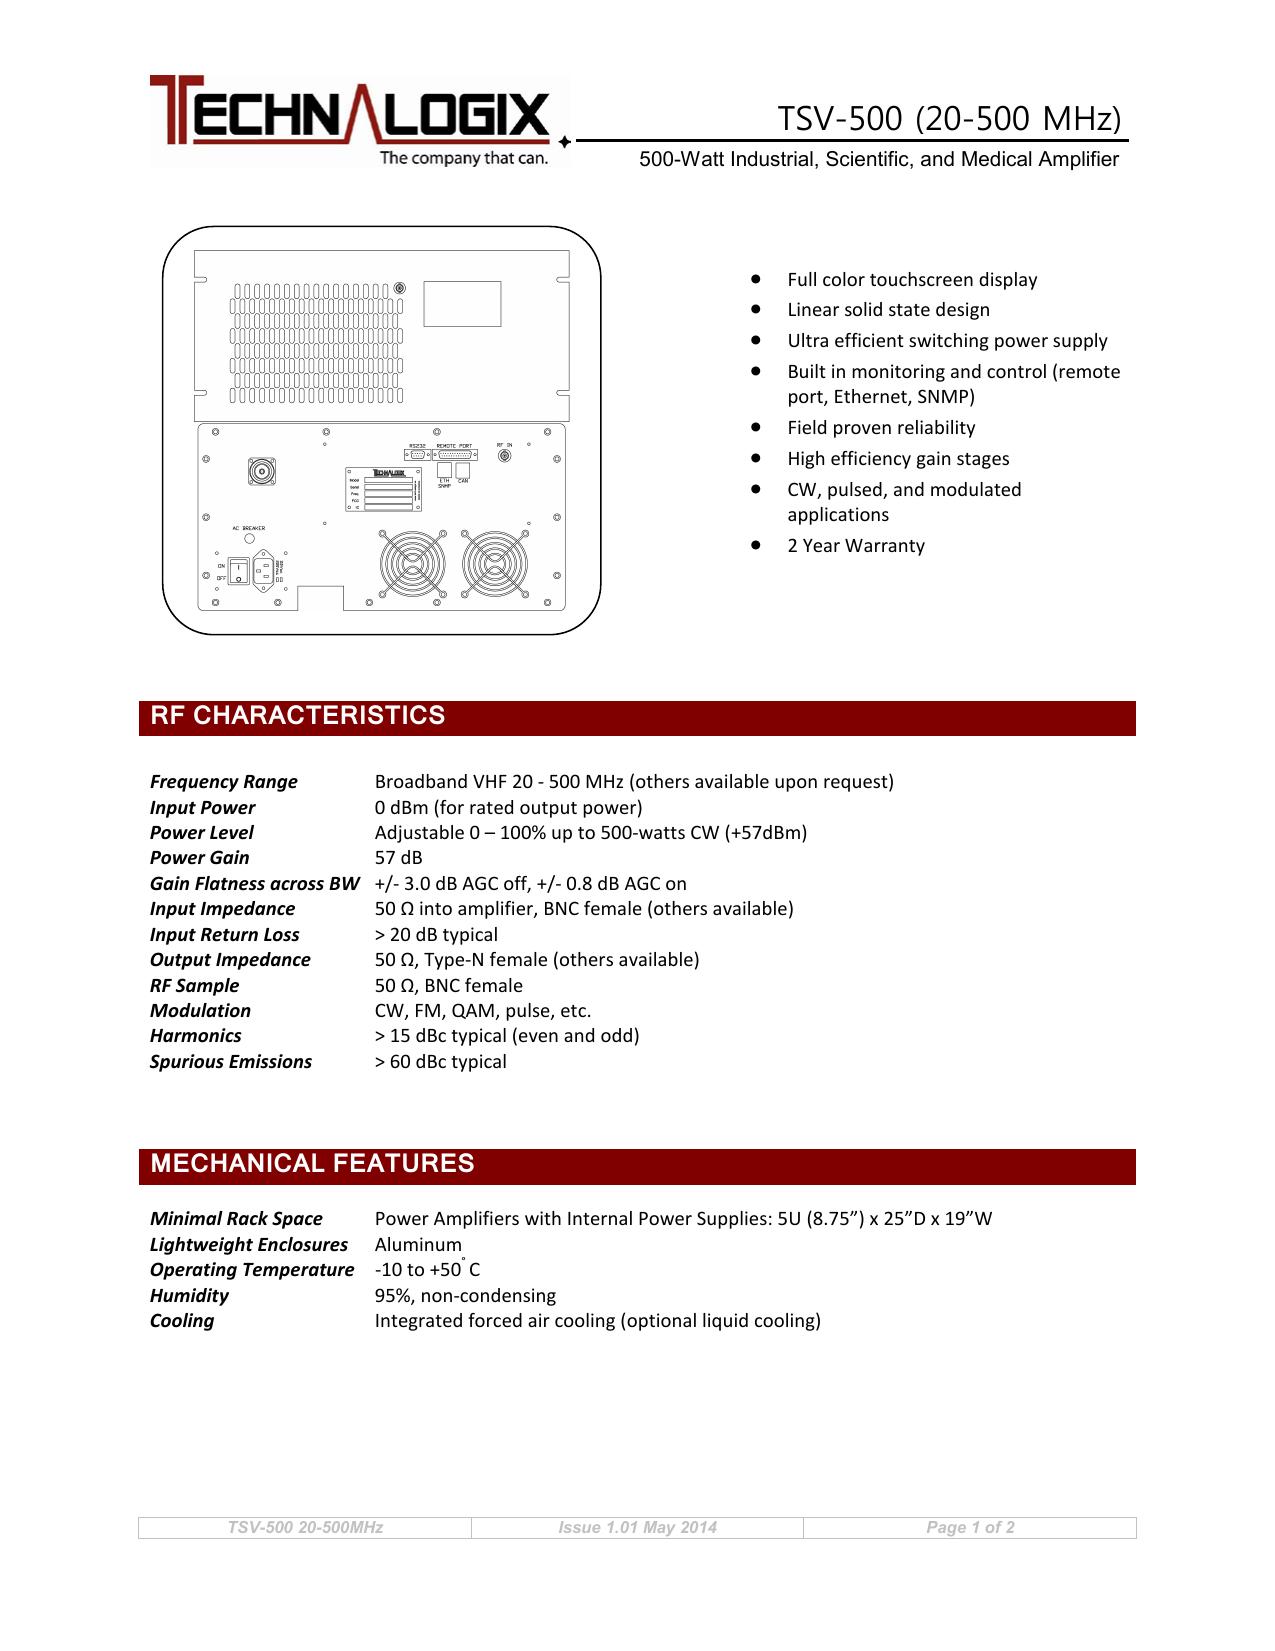 TSV-500 (20-500 MHz) | manualzz com